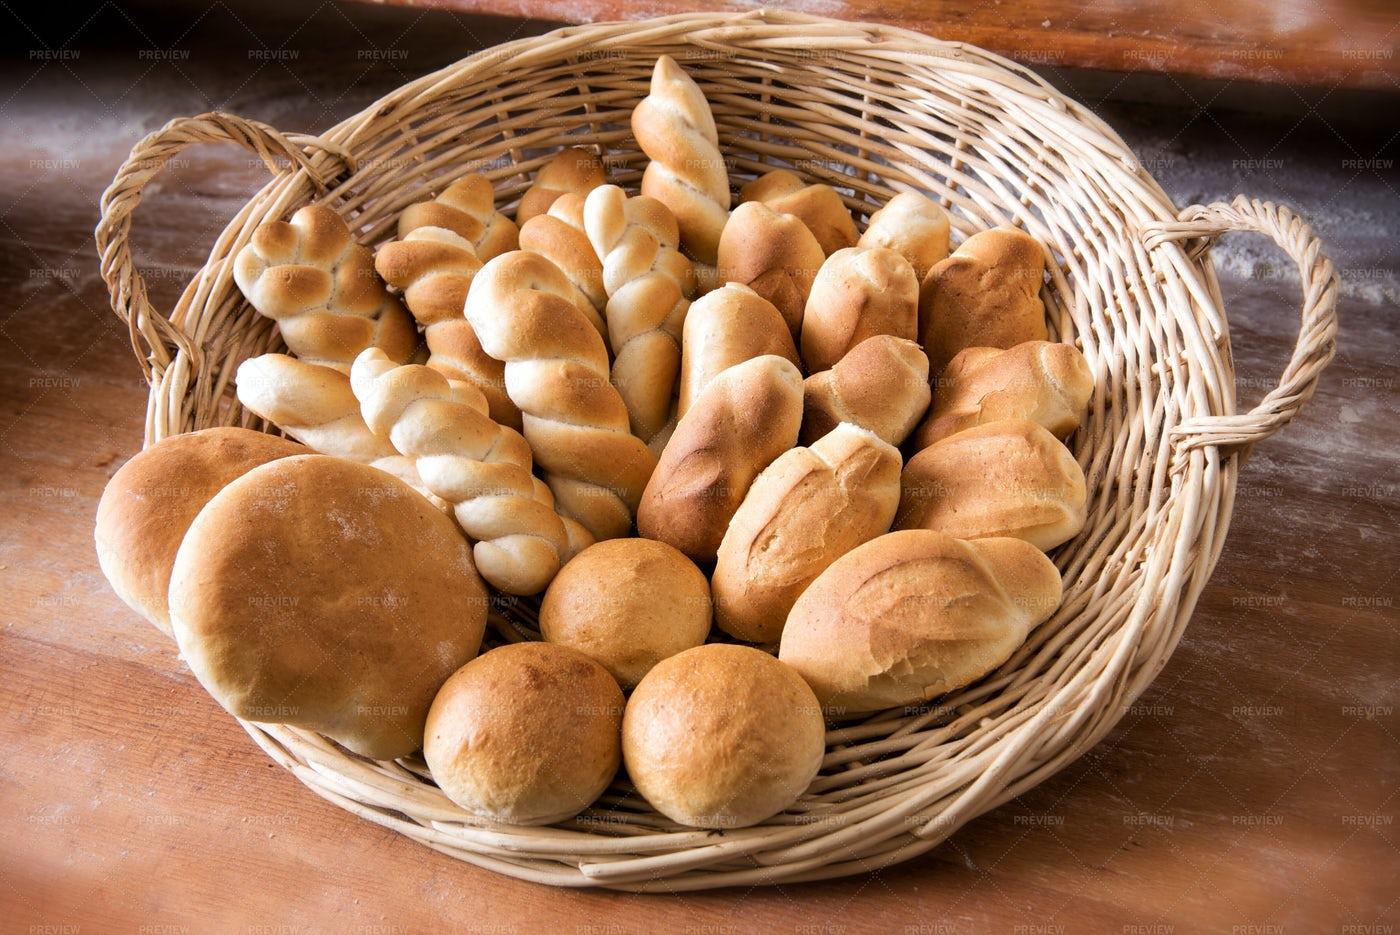 Wicker Basket Fresh Bread: Stock Photos